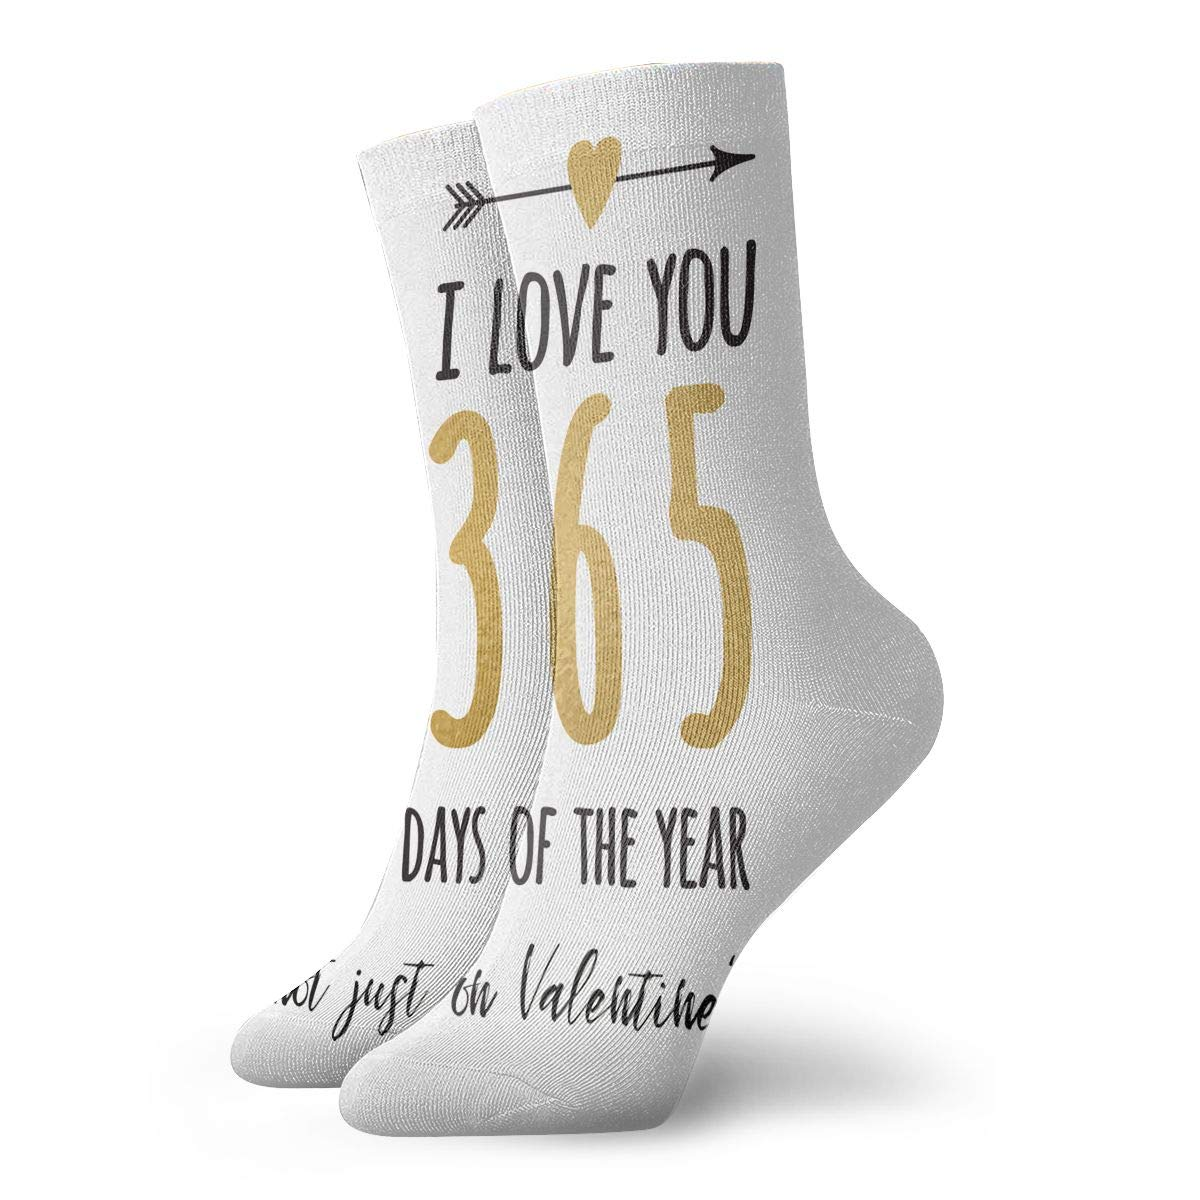 I Love You 365 Days A Year Fashion Dress Socks Short Socks Leisure Travel 11.8 Inch